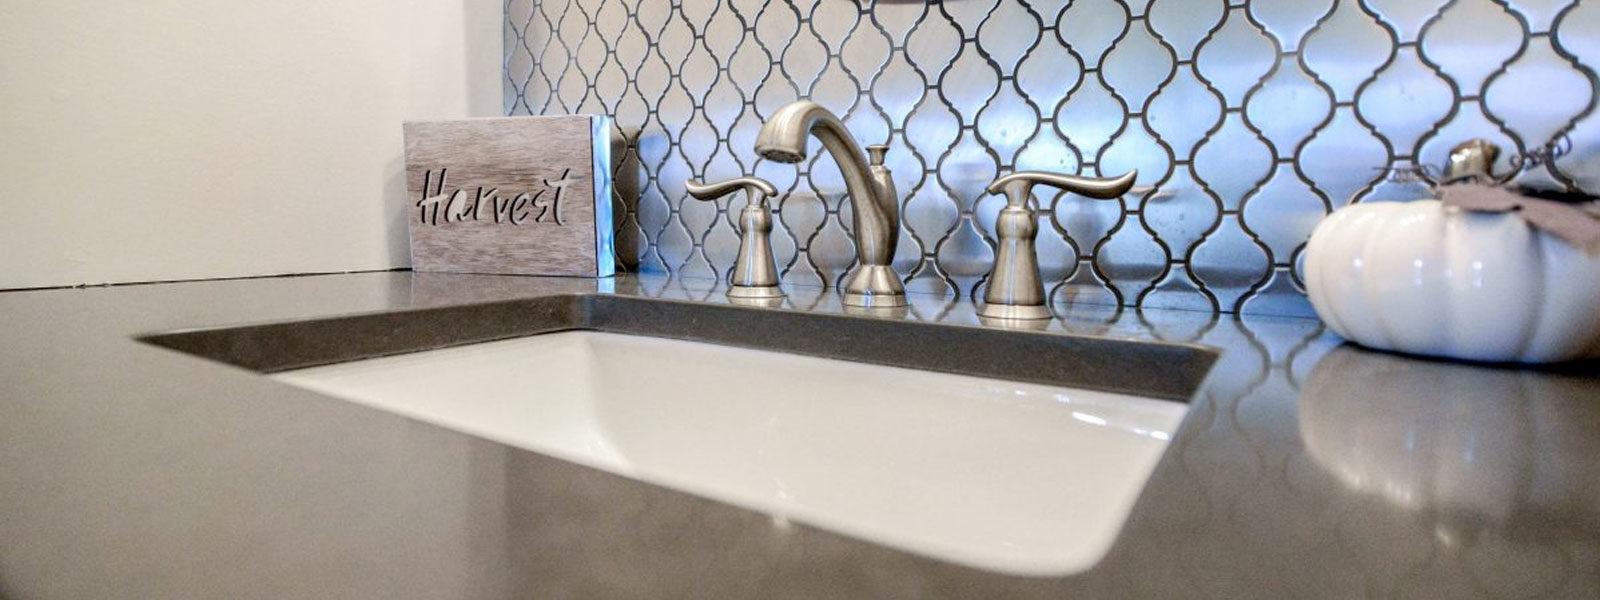 Avoid Trendy: Keys to Keeping a Bath Classy